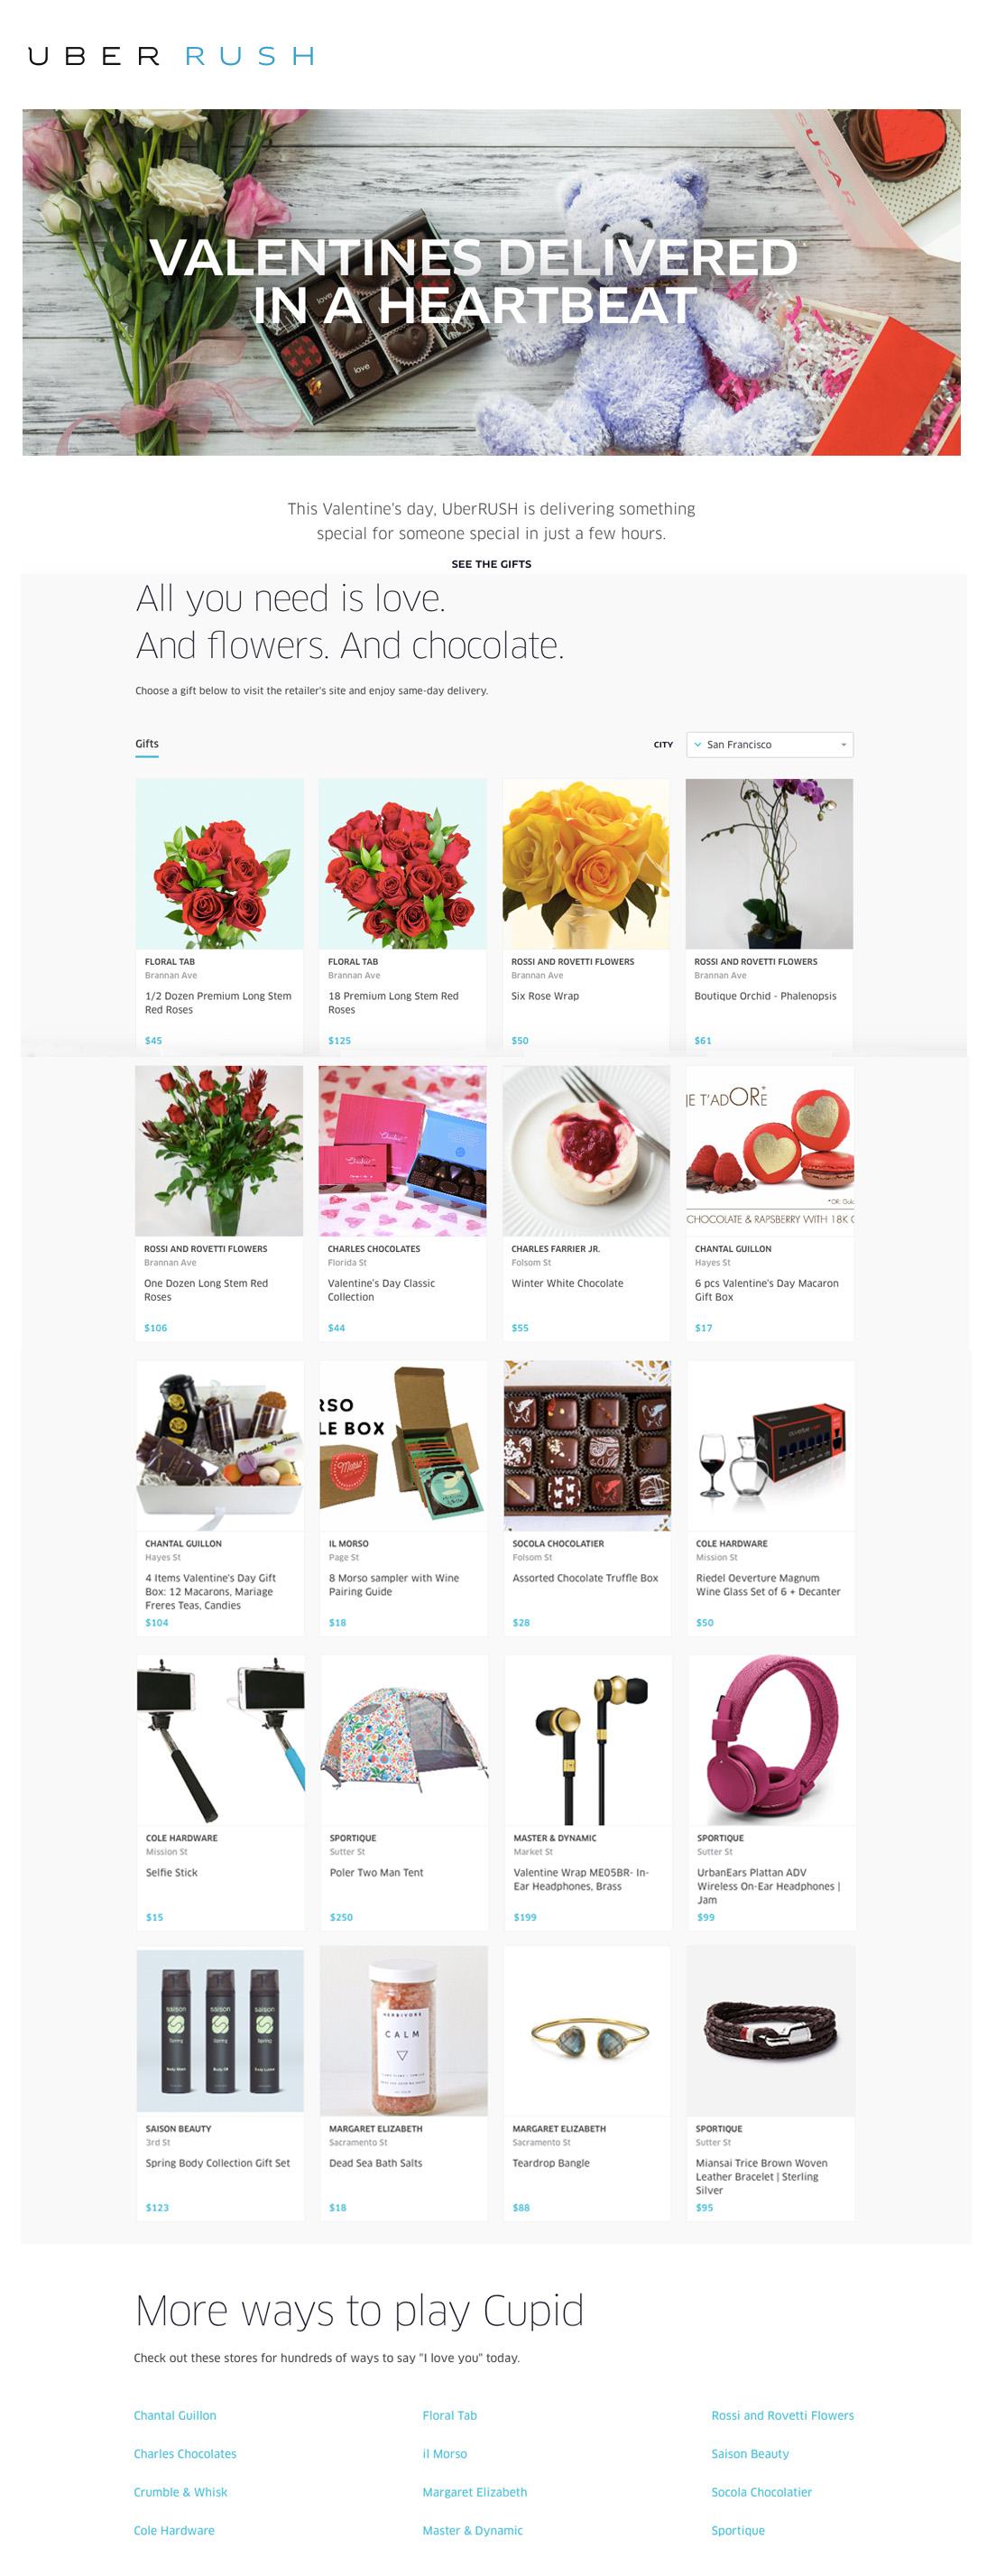 uberrush-valentines-page-2-11-16.jpg